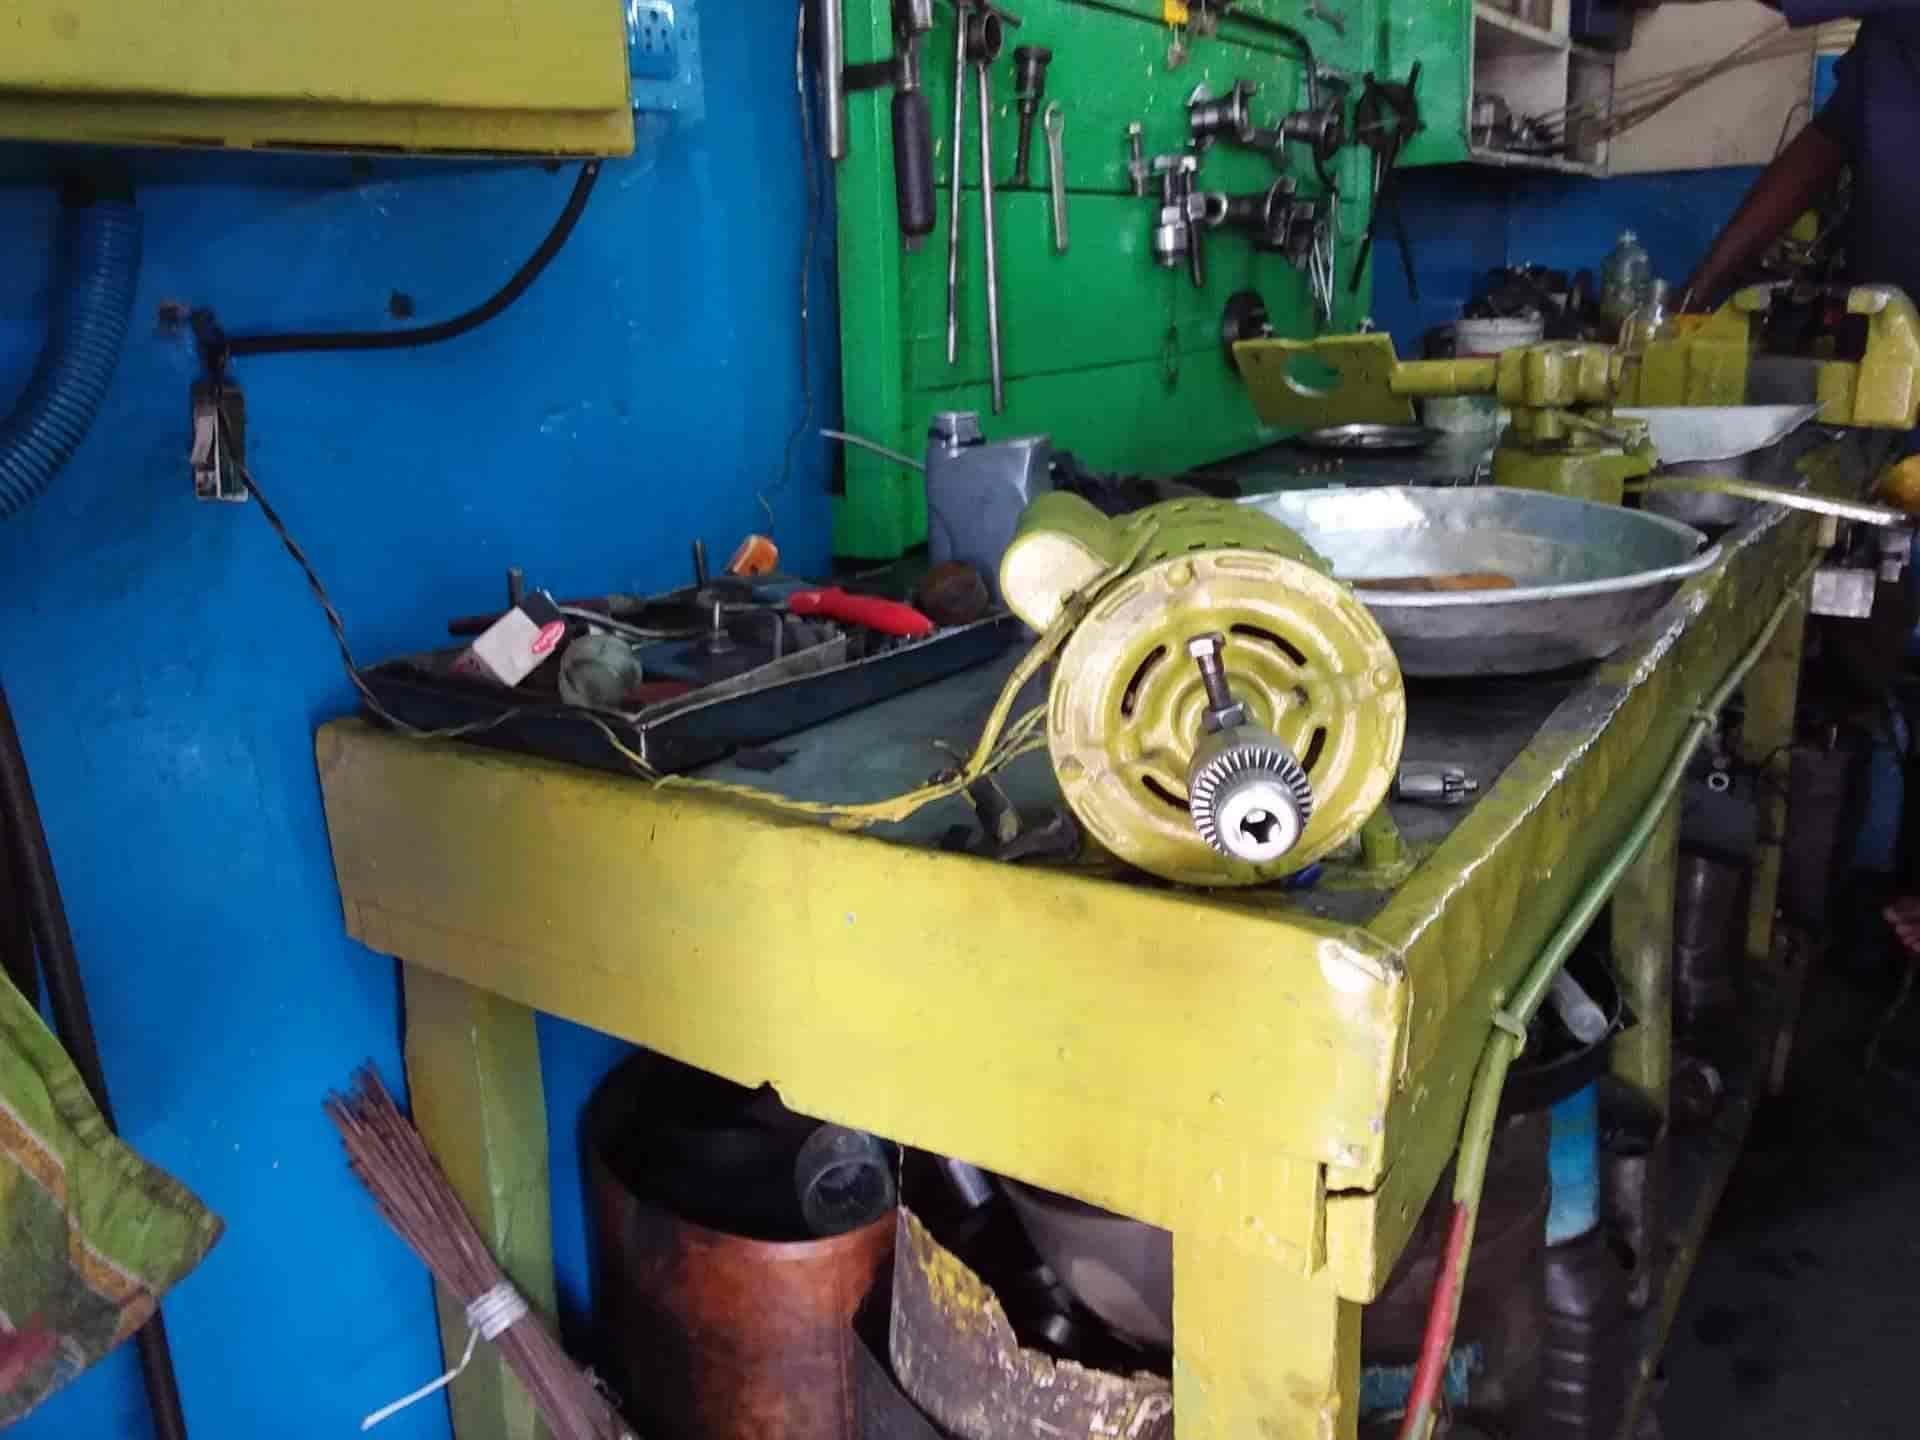 Sri Krishna Diesel Pump Service, Rajapalayam - Car Repair & Services